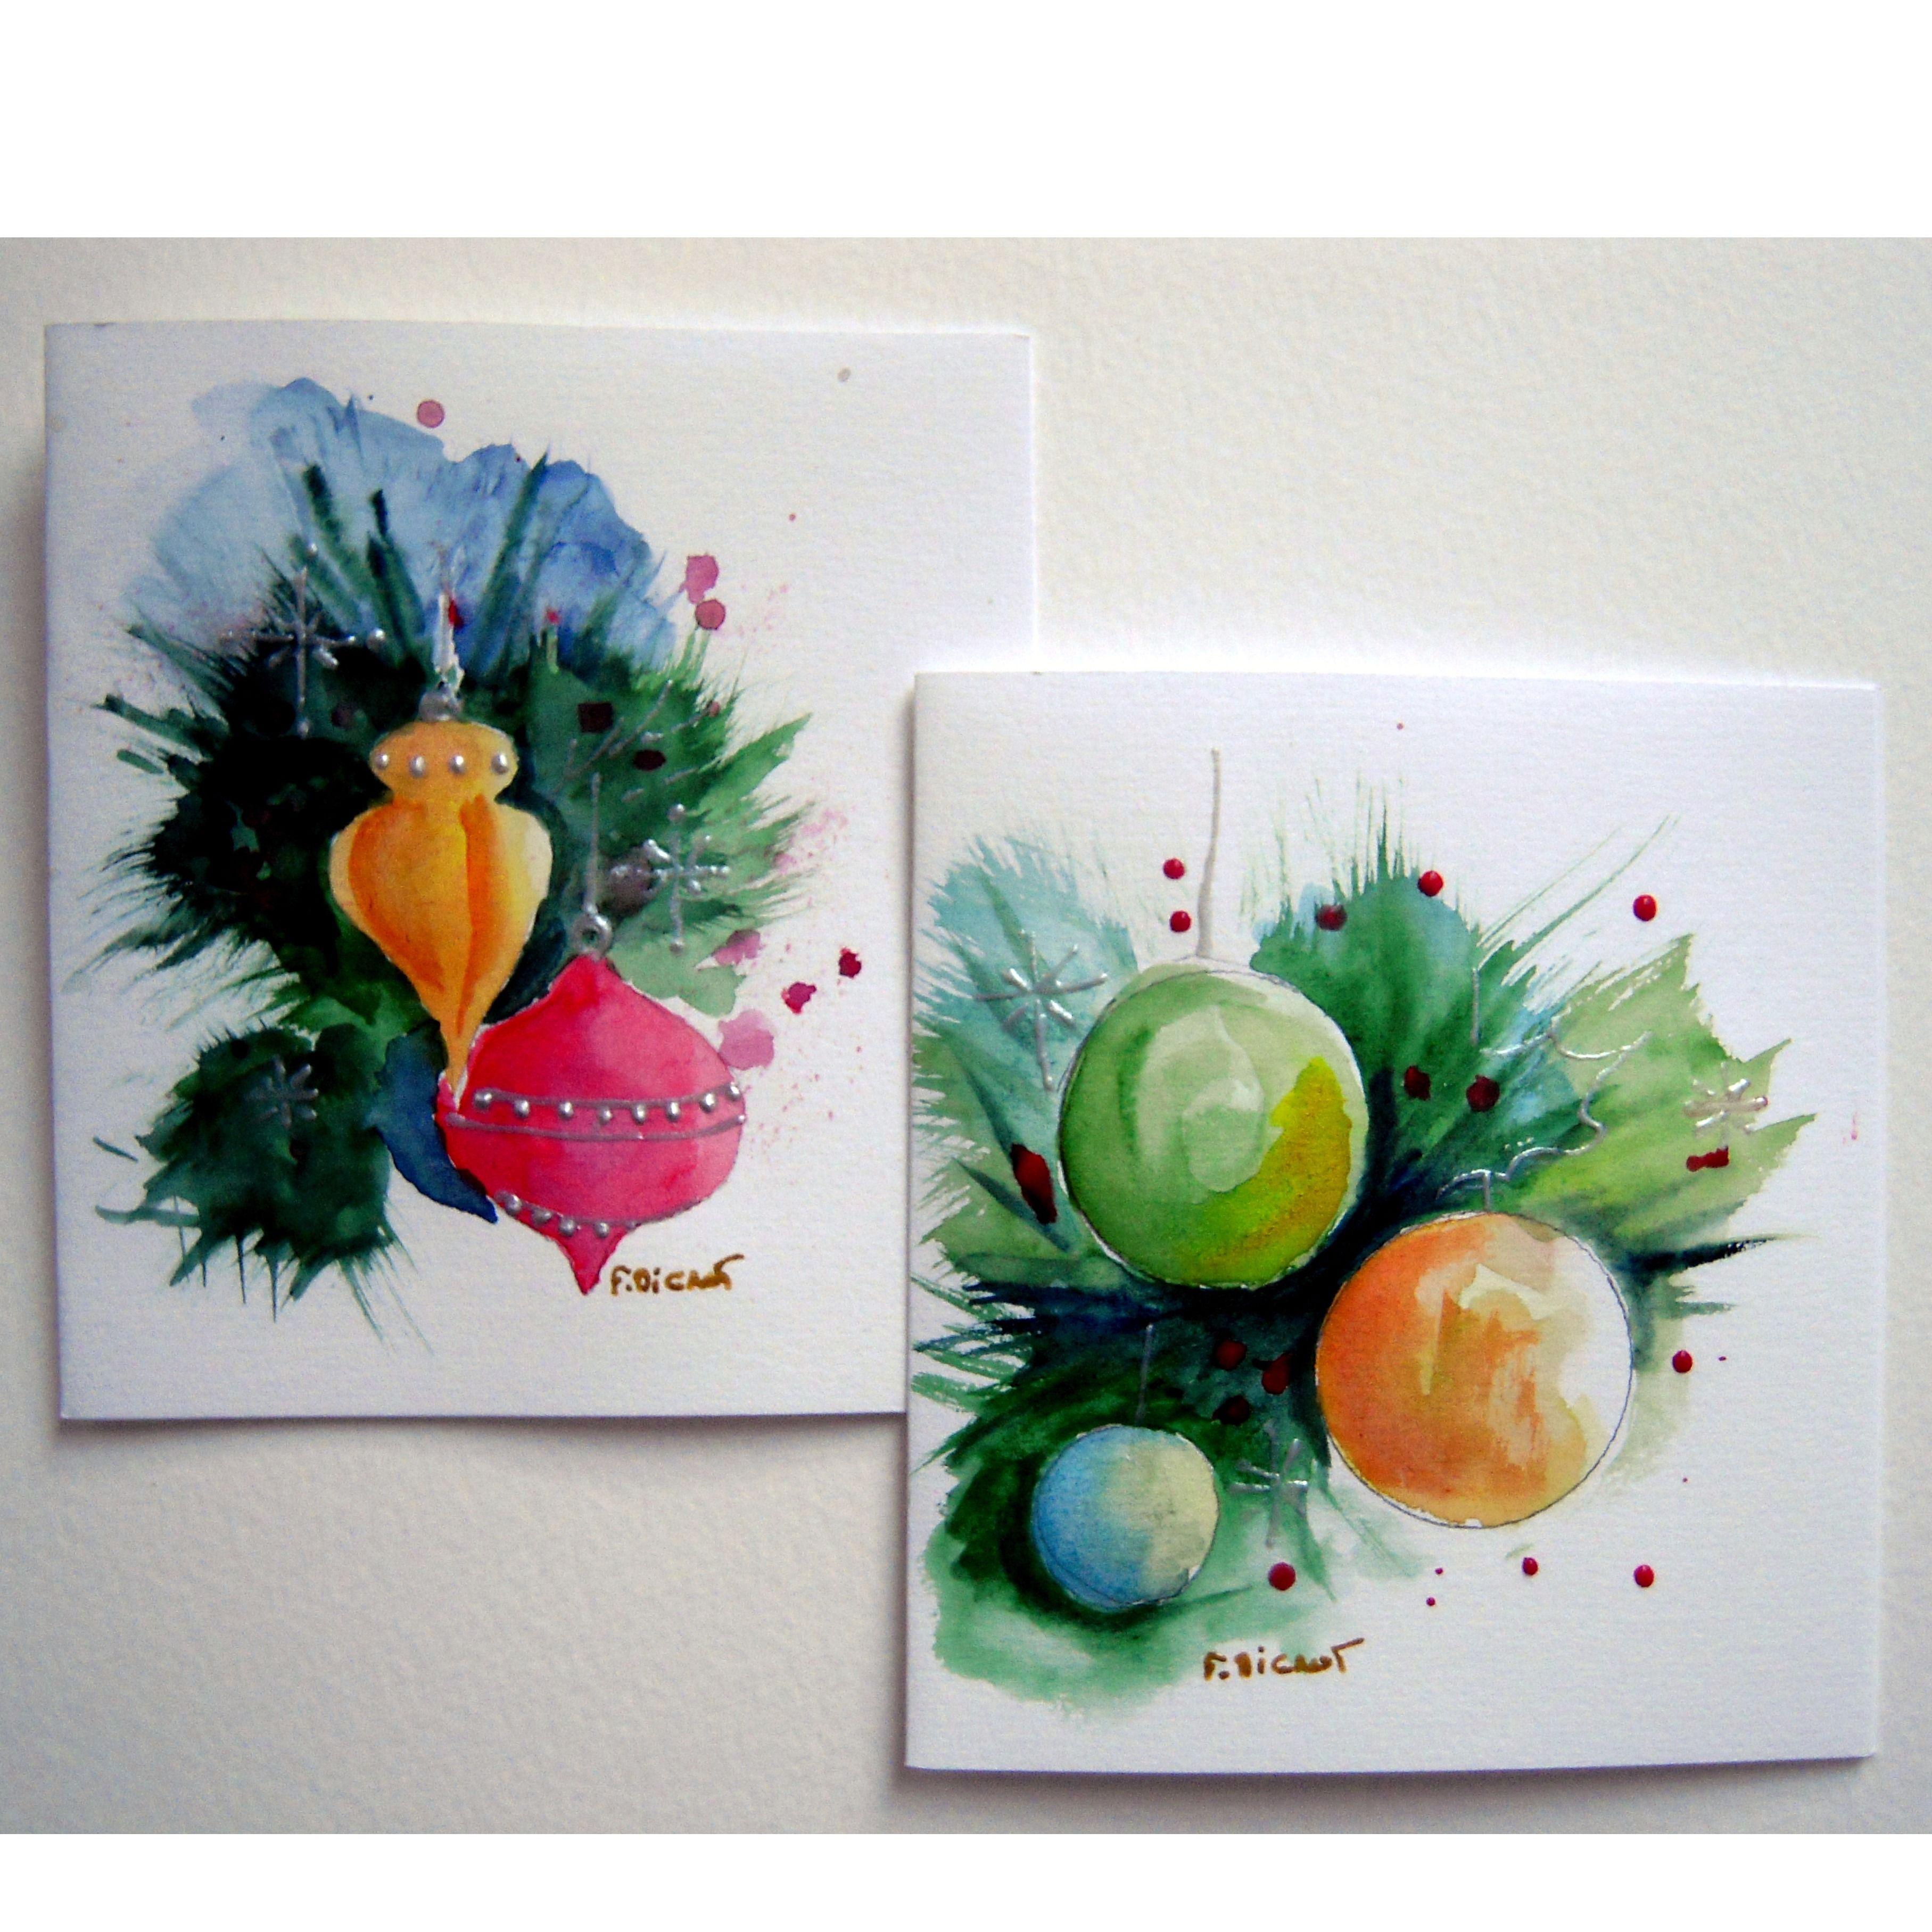 Cartes Aquarelle De Noel Et Voeux Cartes Aquarelle De Noel